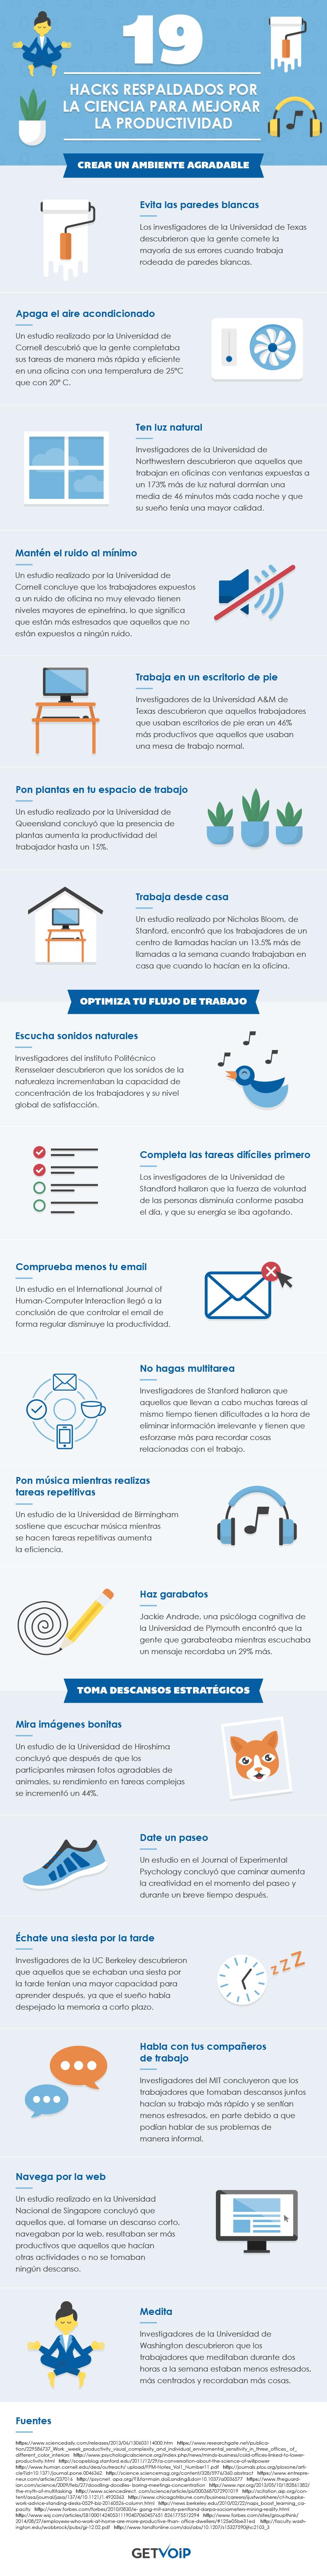 infografia 19 hacks para mejorar la productividad